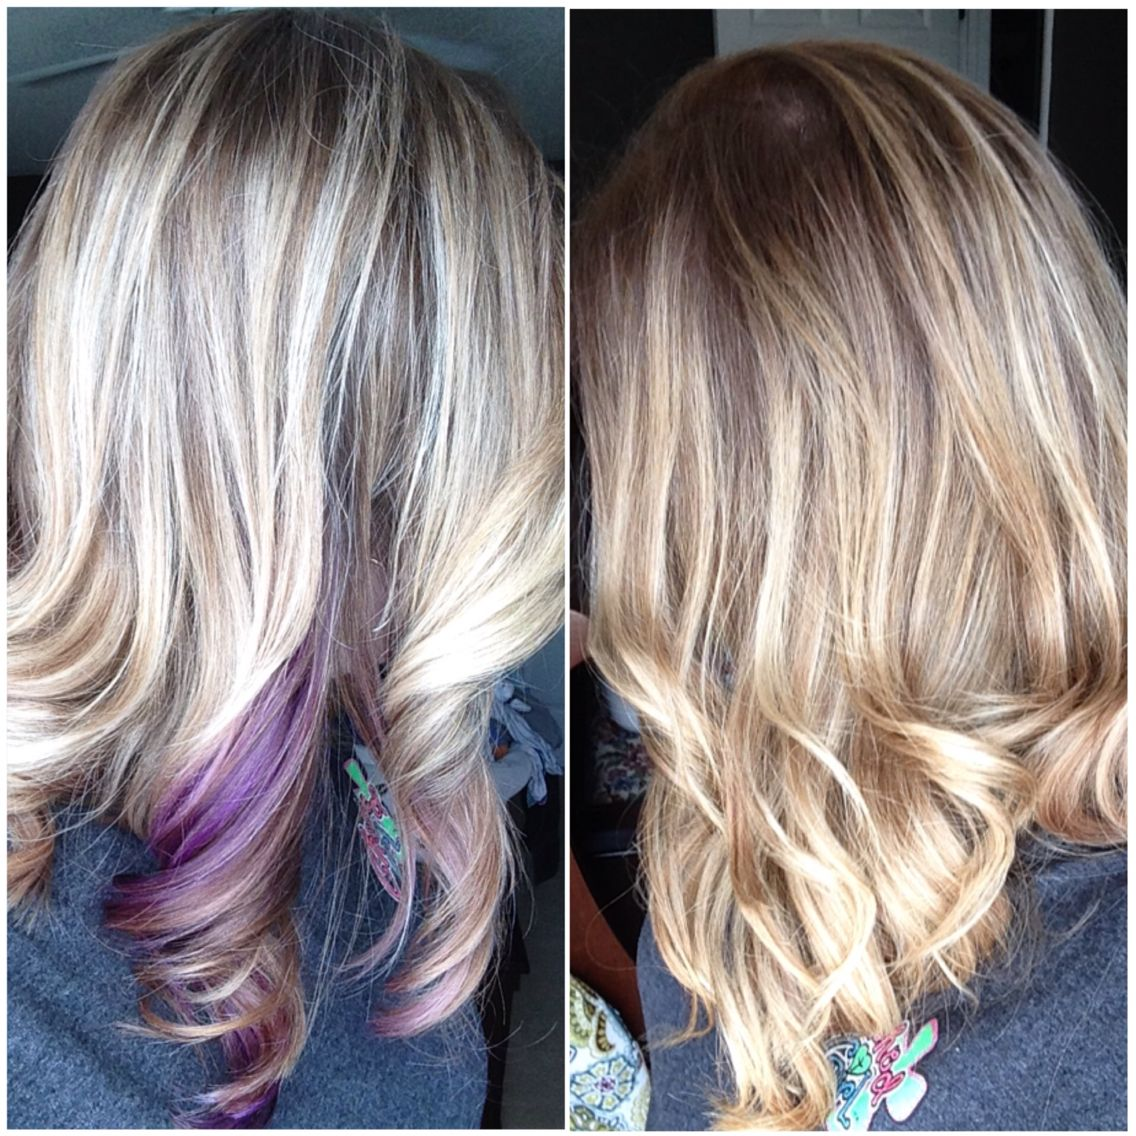 My Hair Blonde Ombr 233 With Purple Peekaboo Hair Purple